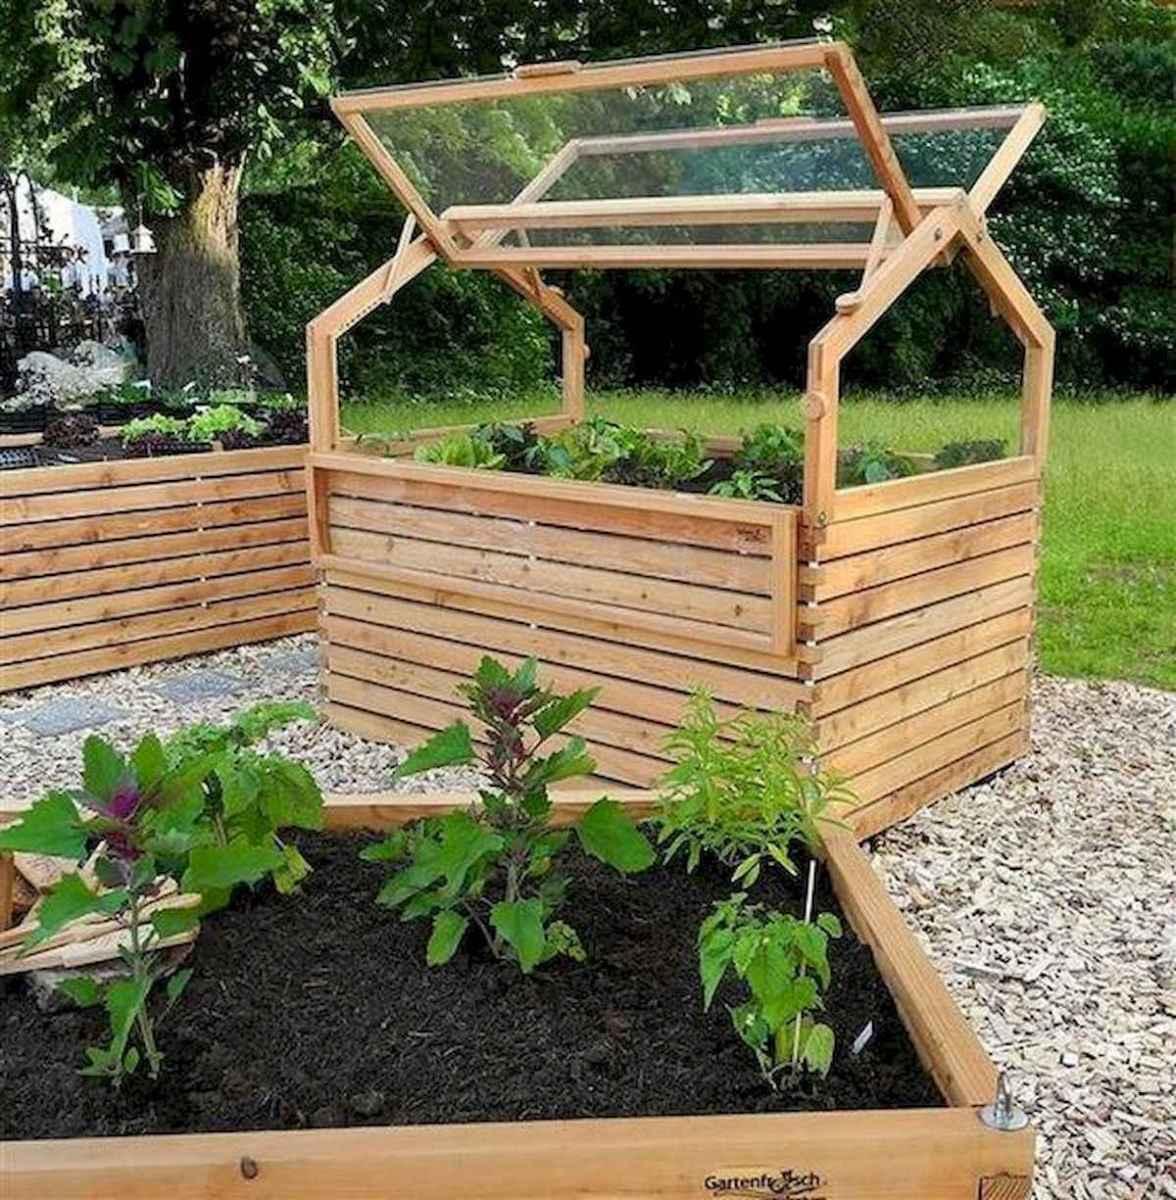 55 Favorite Garden Boxes Raised Design Ideas (3)